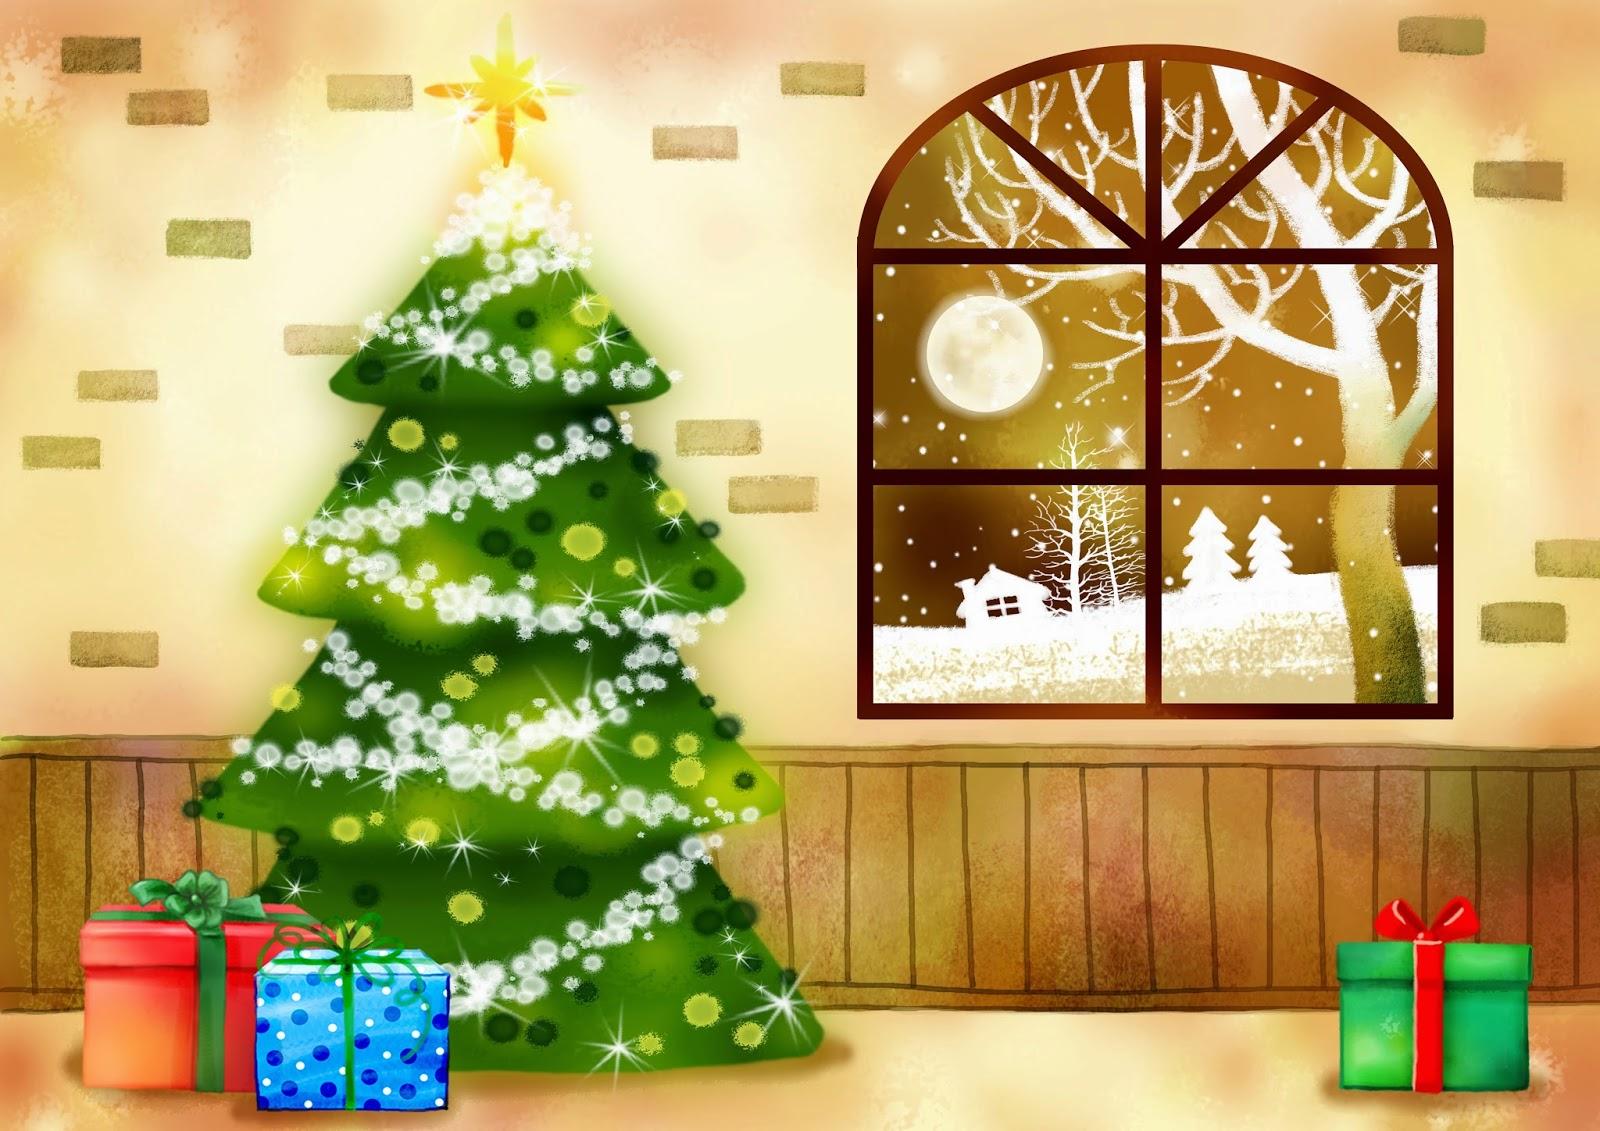 Christmas-decorated-home-snowfall-view-through-window-cartoon-image-4961x3508-6.jpg